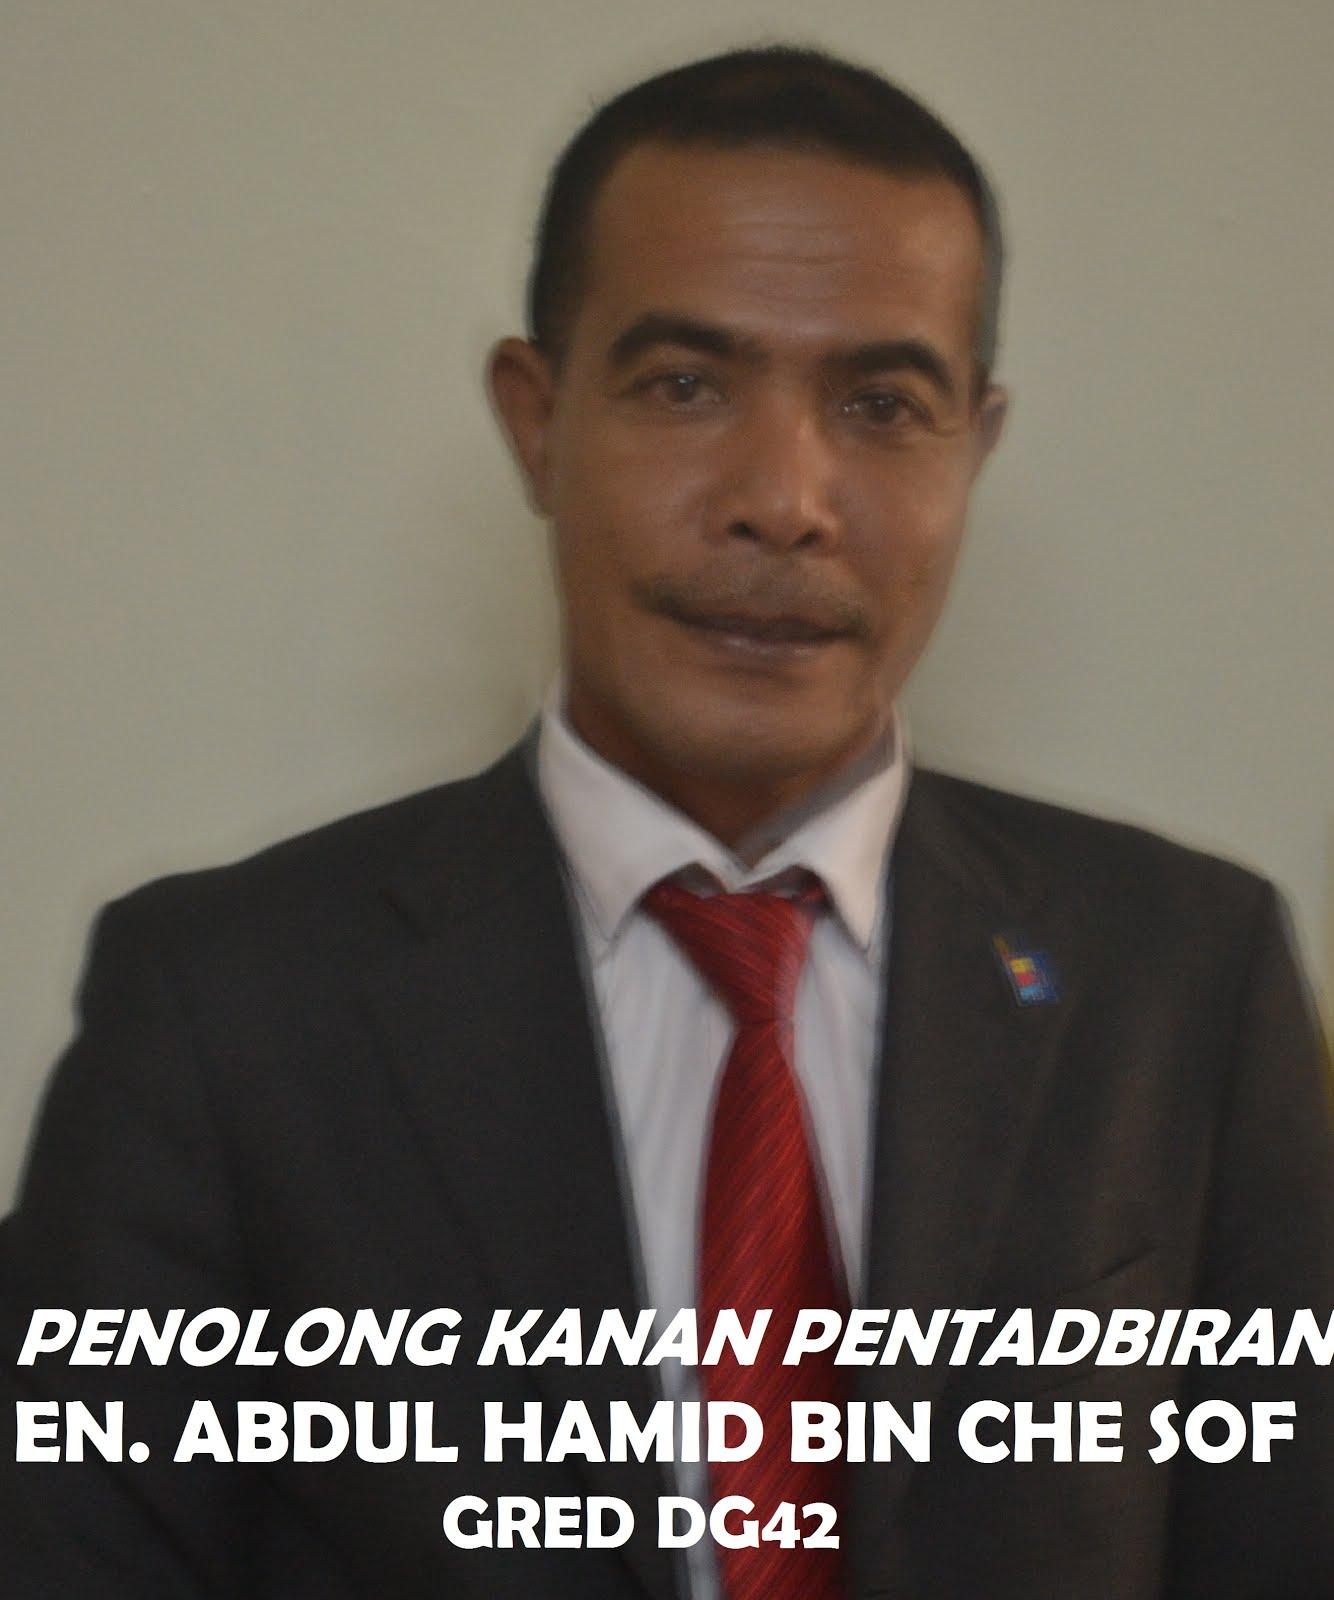 PK1/PKP